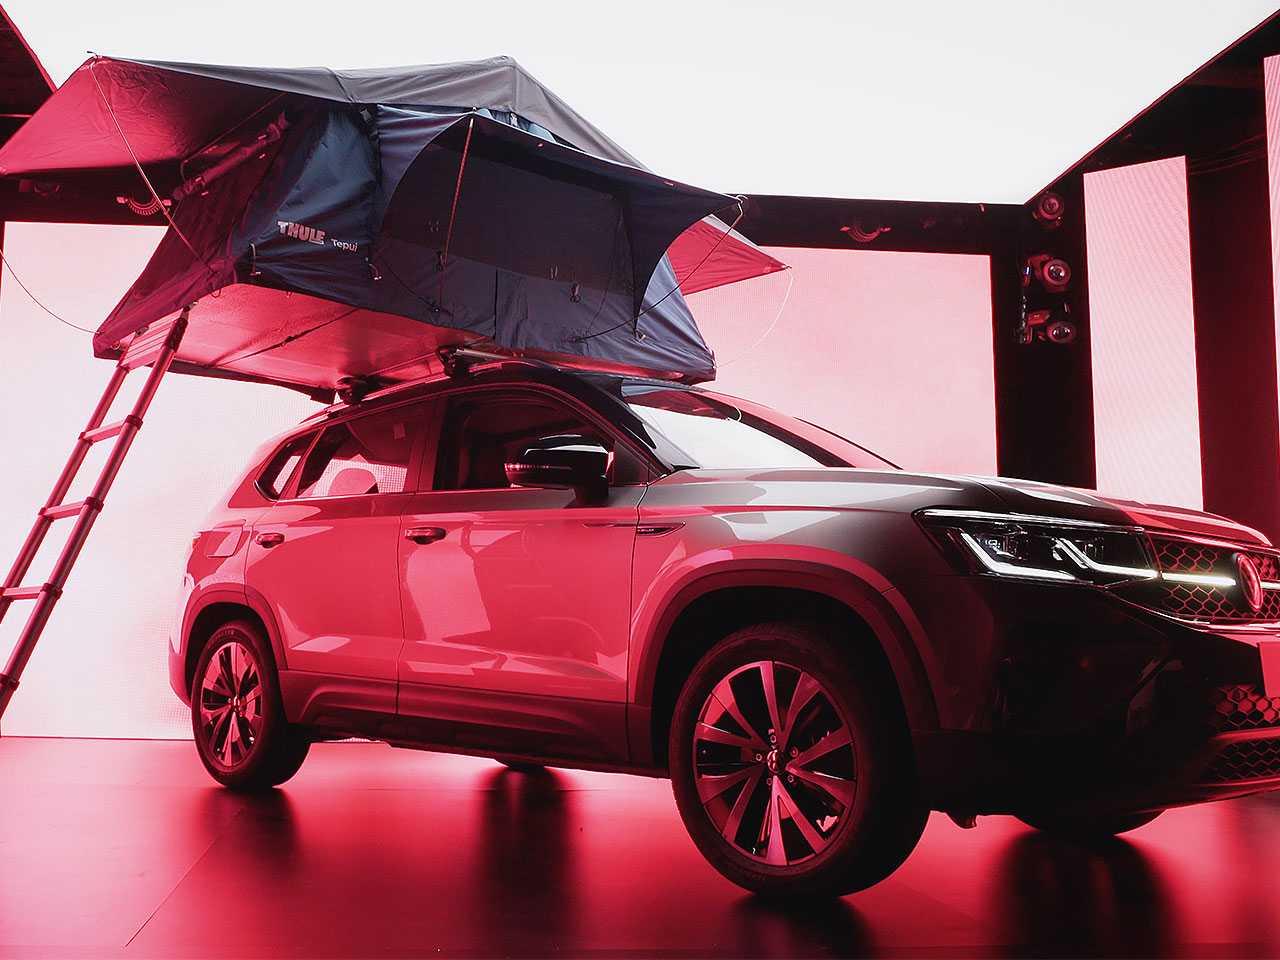 VW Taos terá até barraca para camping entre os acessórios